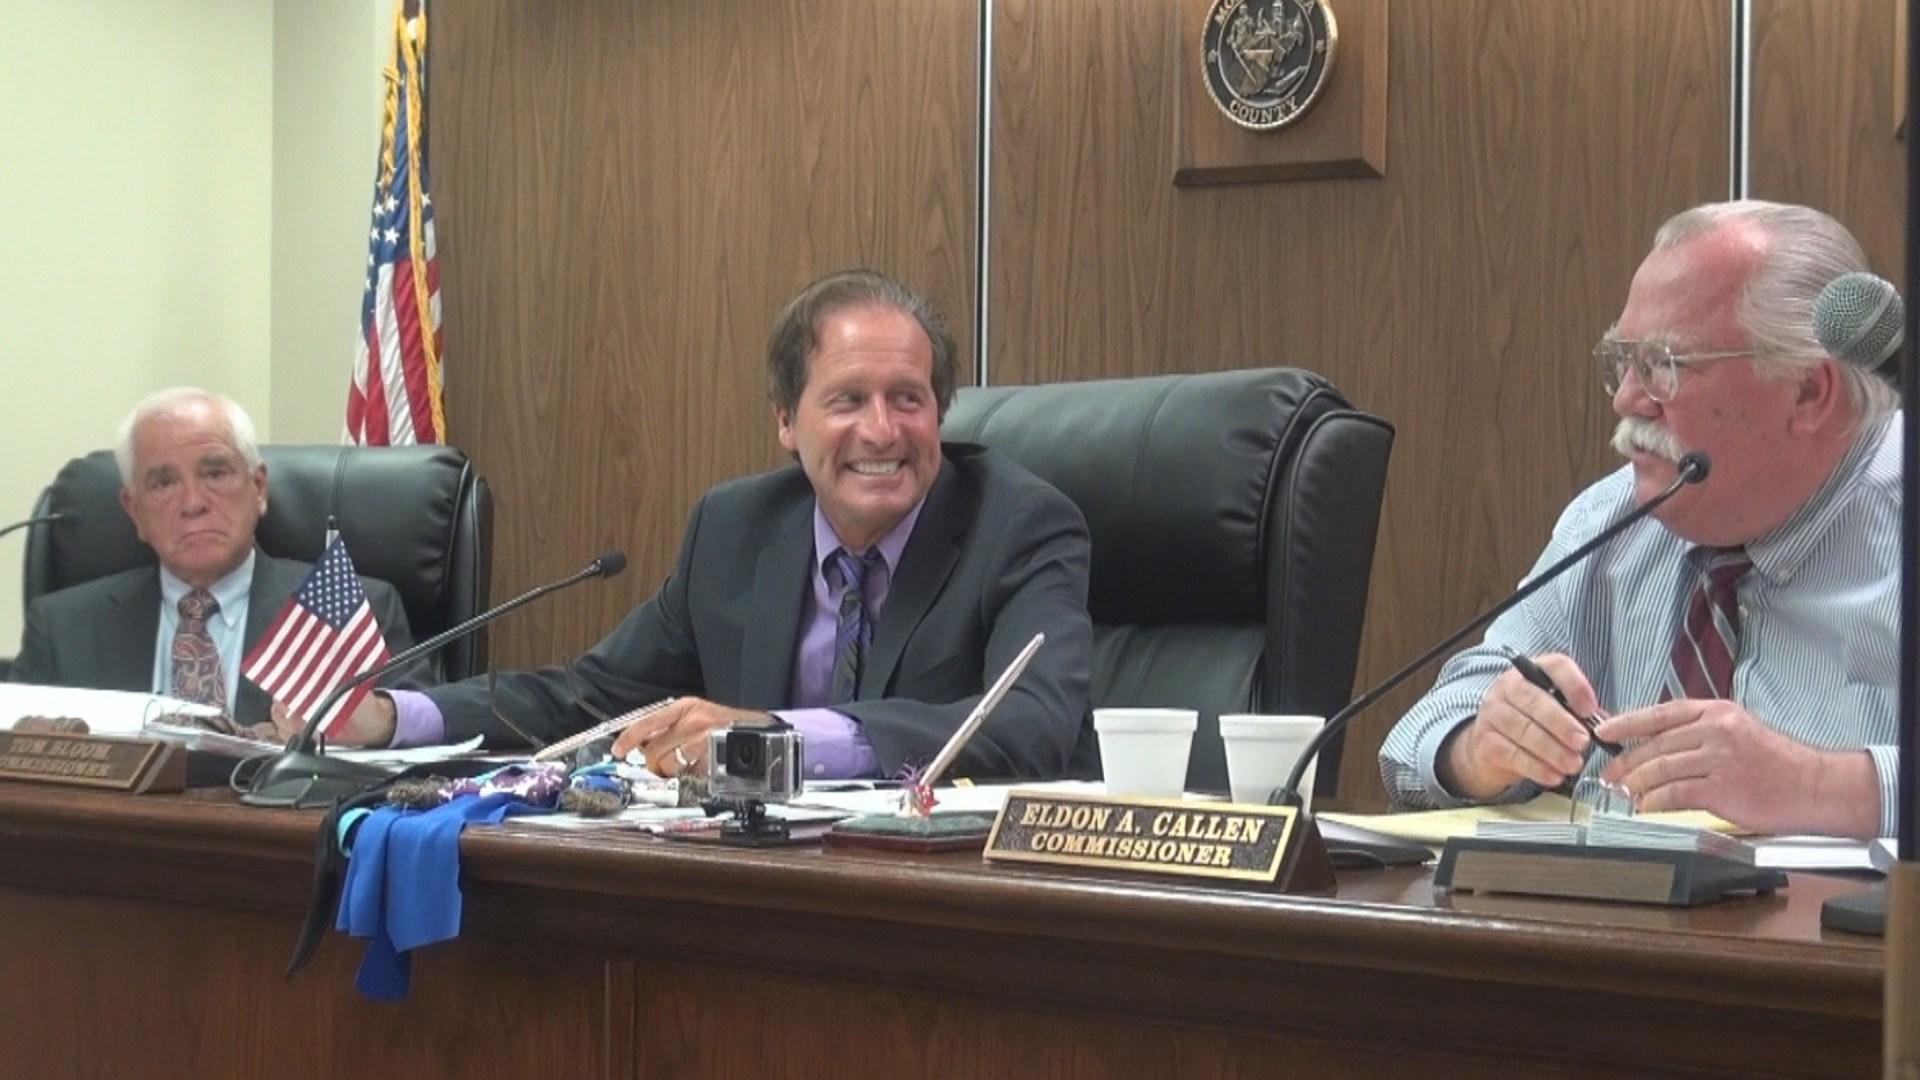 Monongalia County Commission Tom Bloom